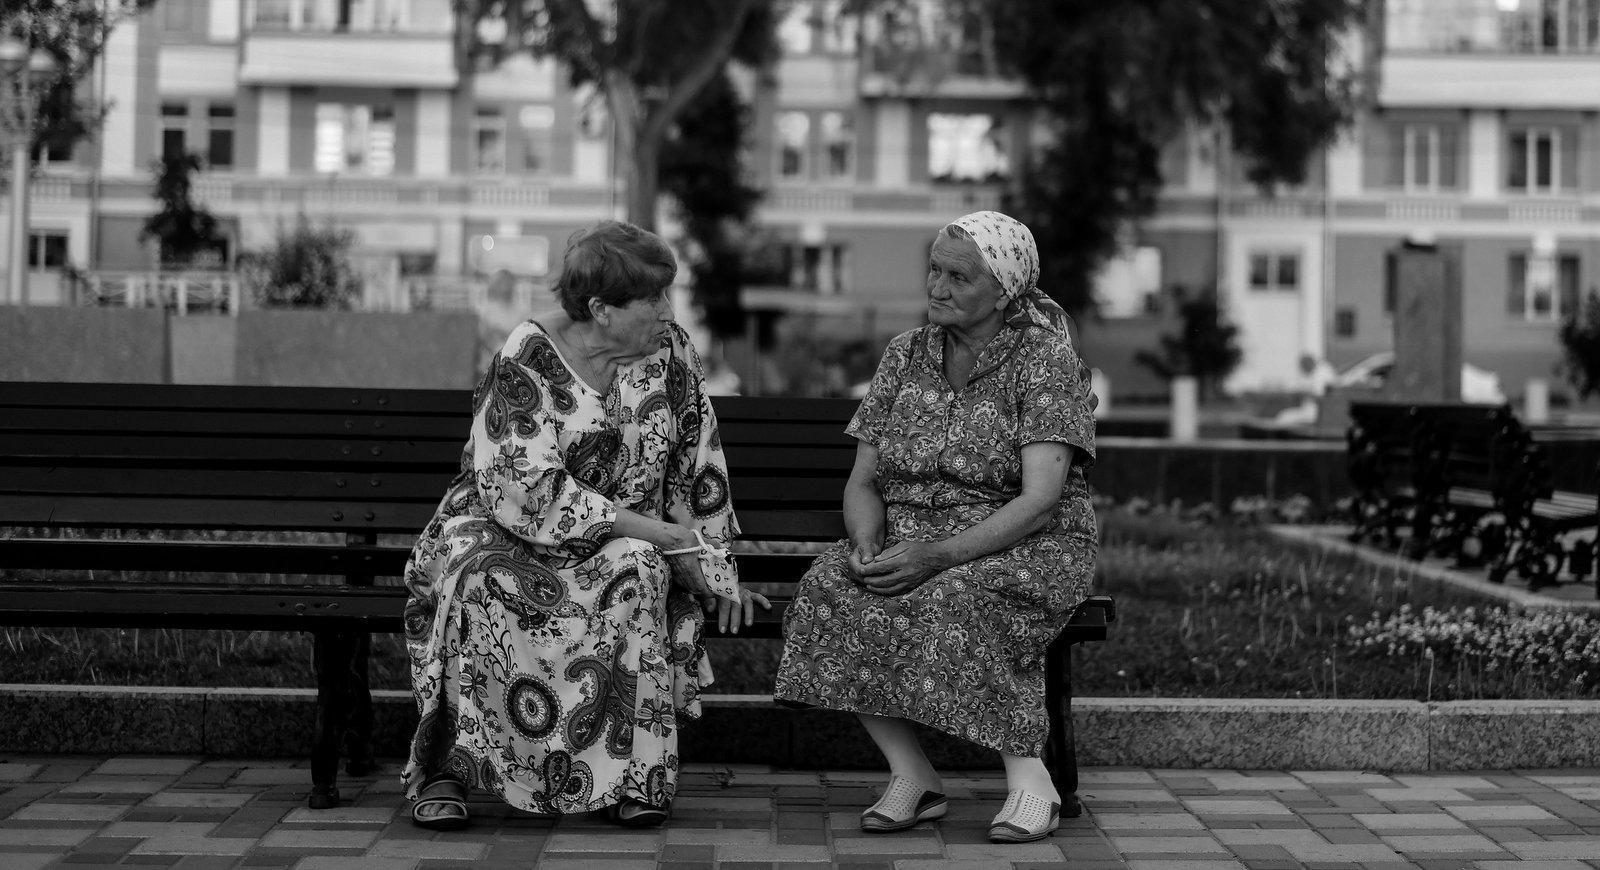 Putin's Botched Pension Reform